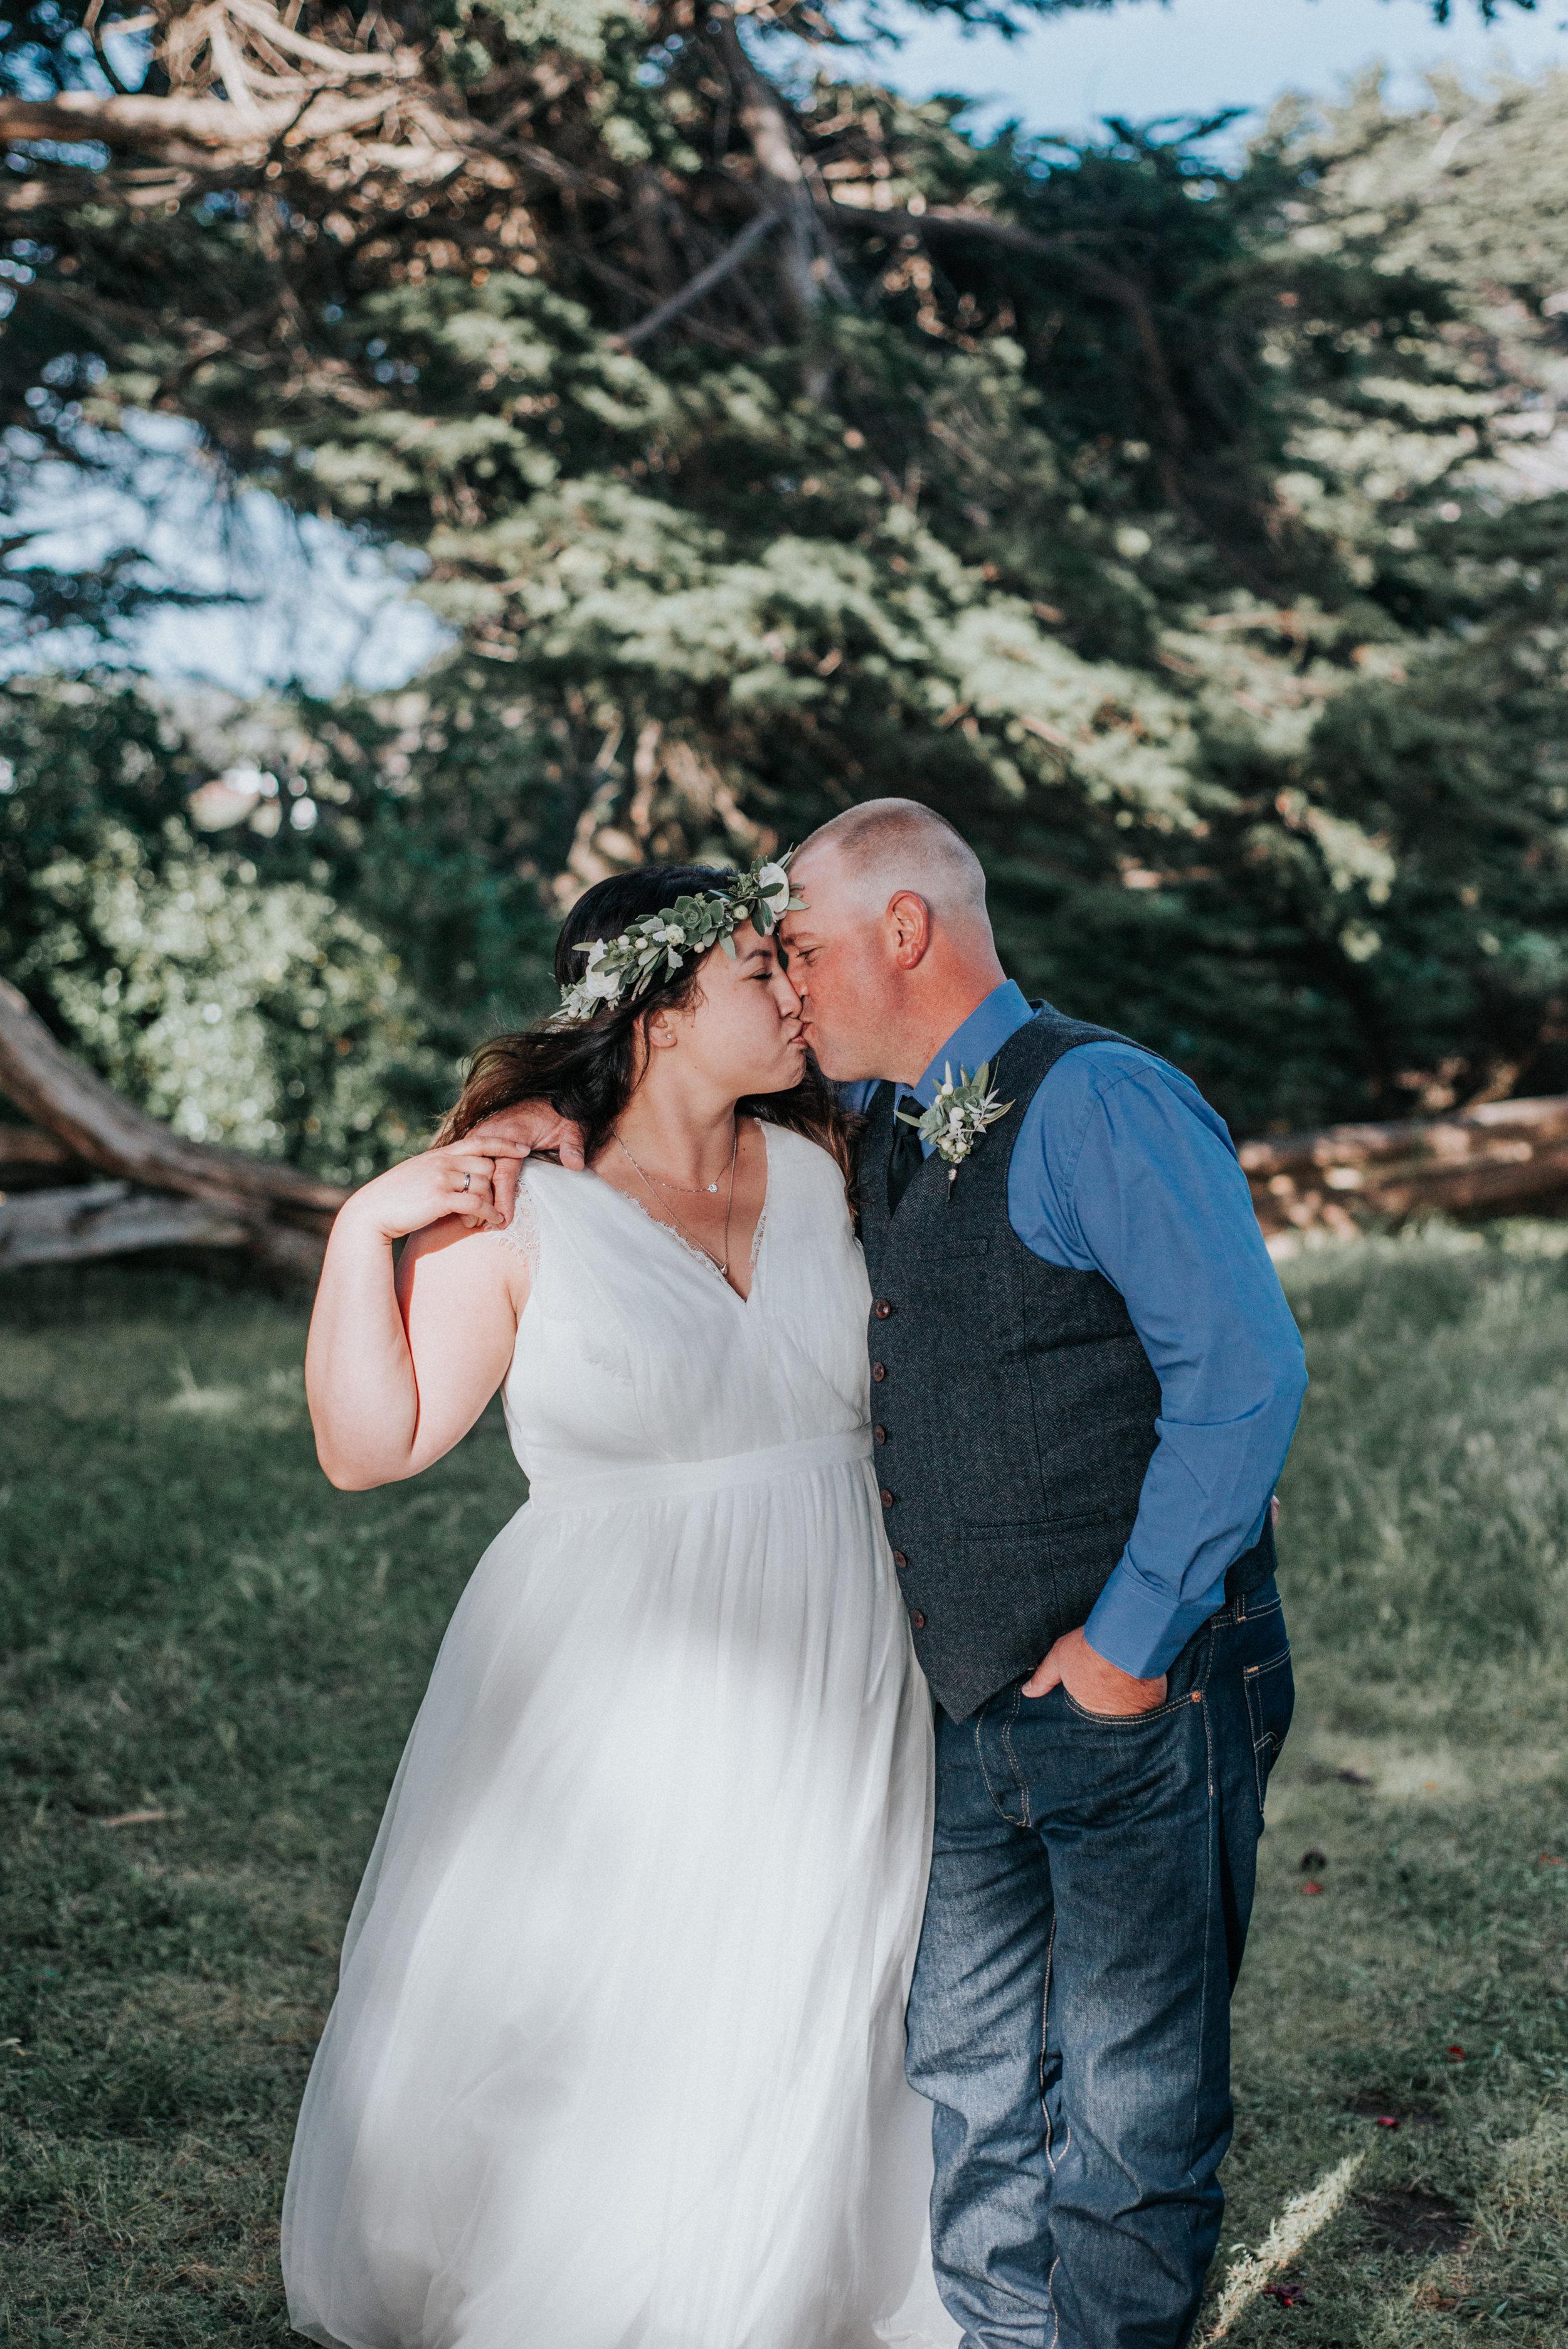 Brianna & Mark   Weddings